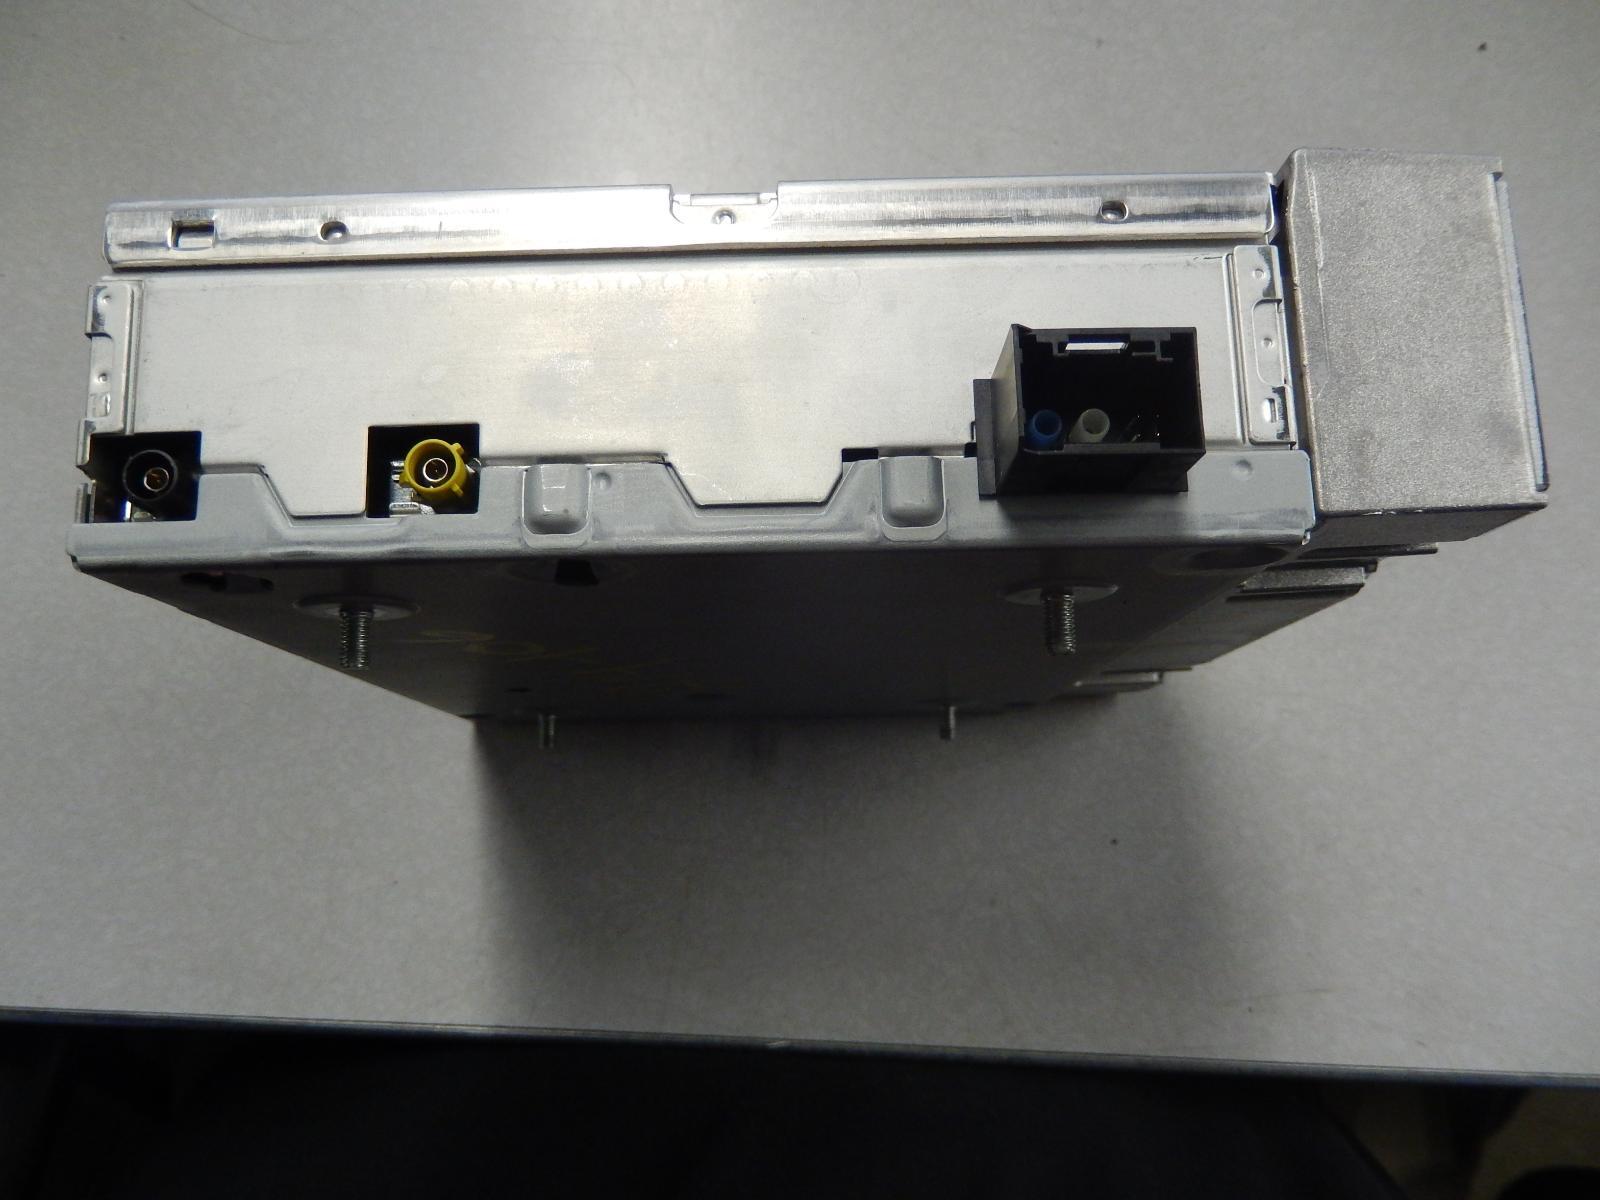 2008 mercedes e350 oem amplifier harman kardon logic 7 id. Black Bedroom Furniture Sets. Home Design Ideas